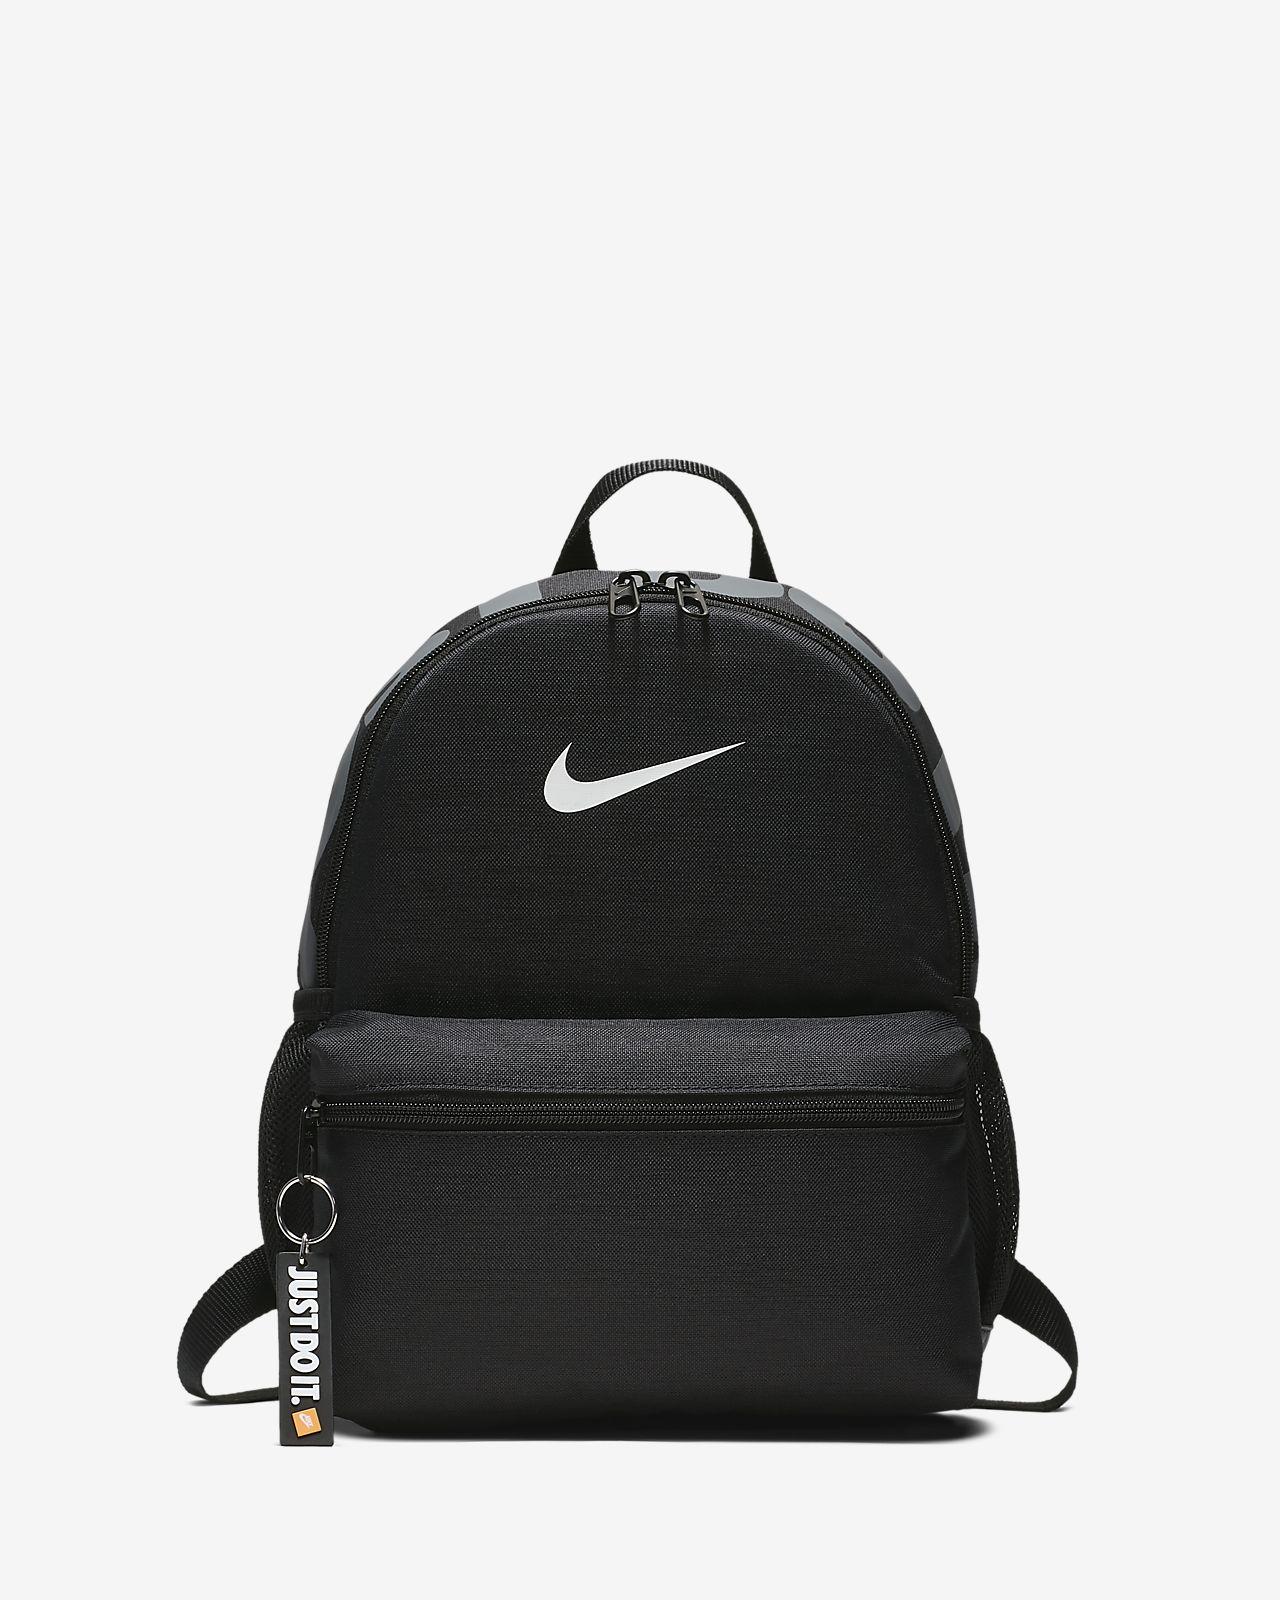 1e18b183b917 Nike Brasilia Just Do It Kids  Backpack (Mini). Nike.com CA